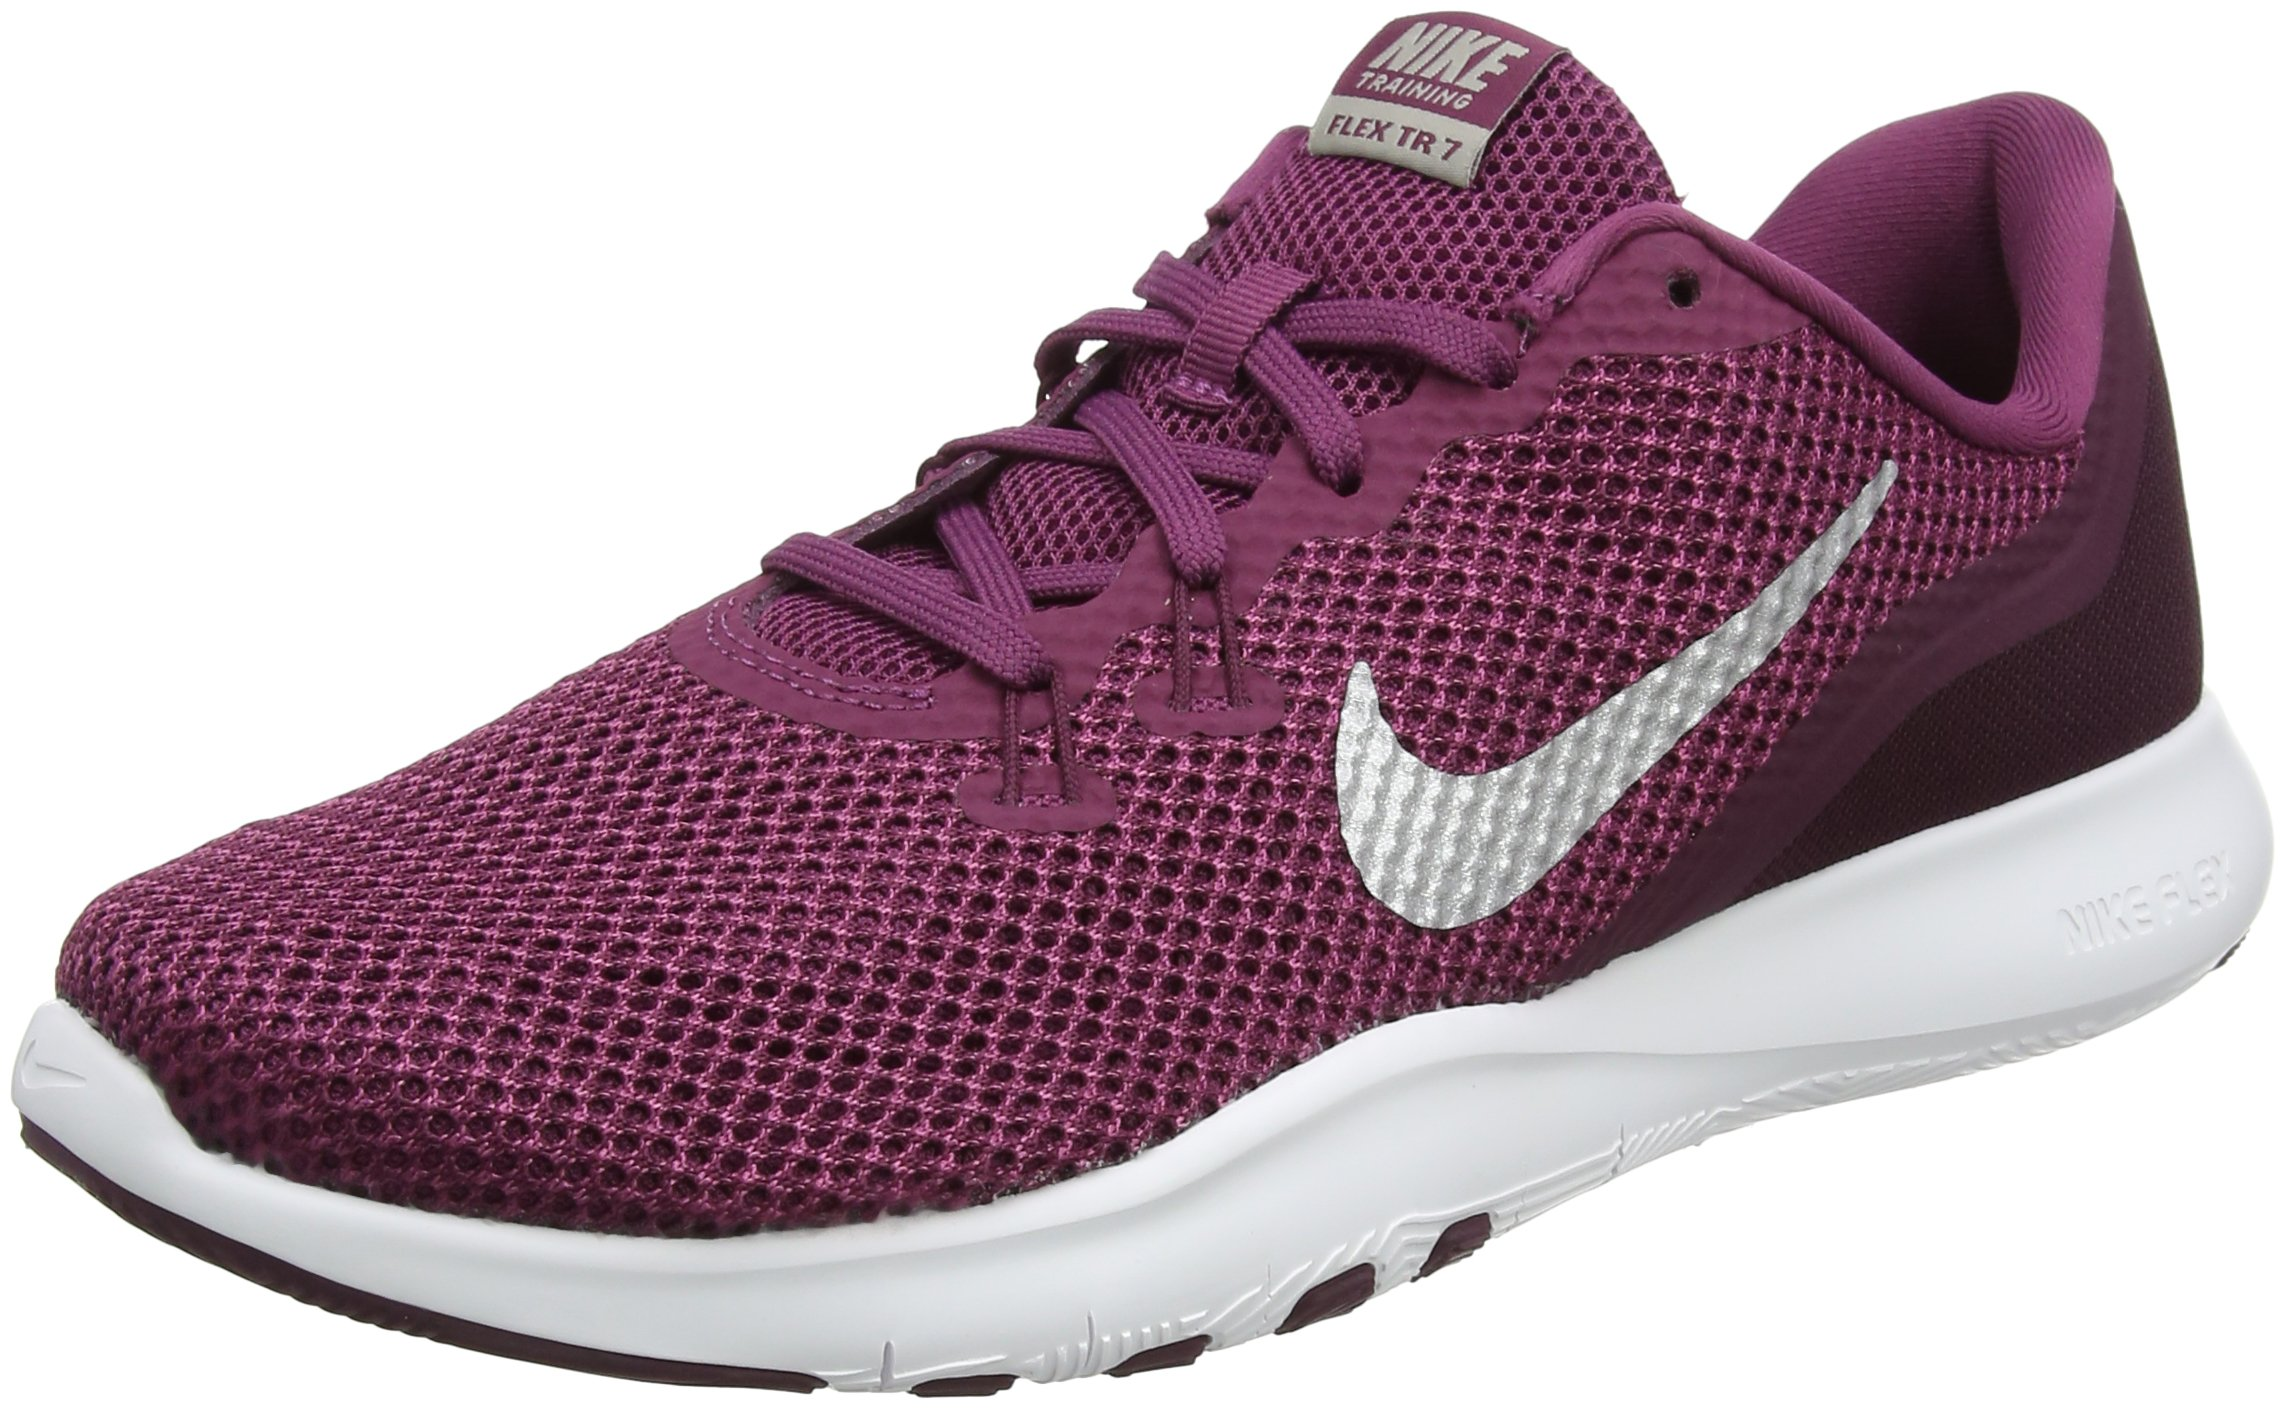 3b2c7d8ea27a Galleon - Nike Women s Flex TR 7 Training Shoe Tea Berry Metallic  Silver Bordeaux Size 10 M US